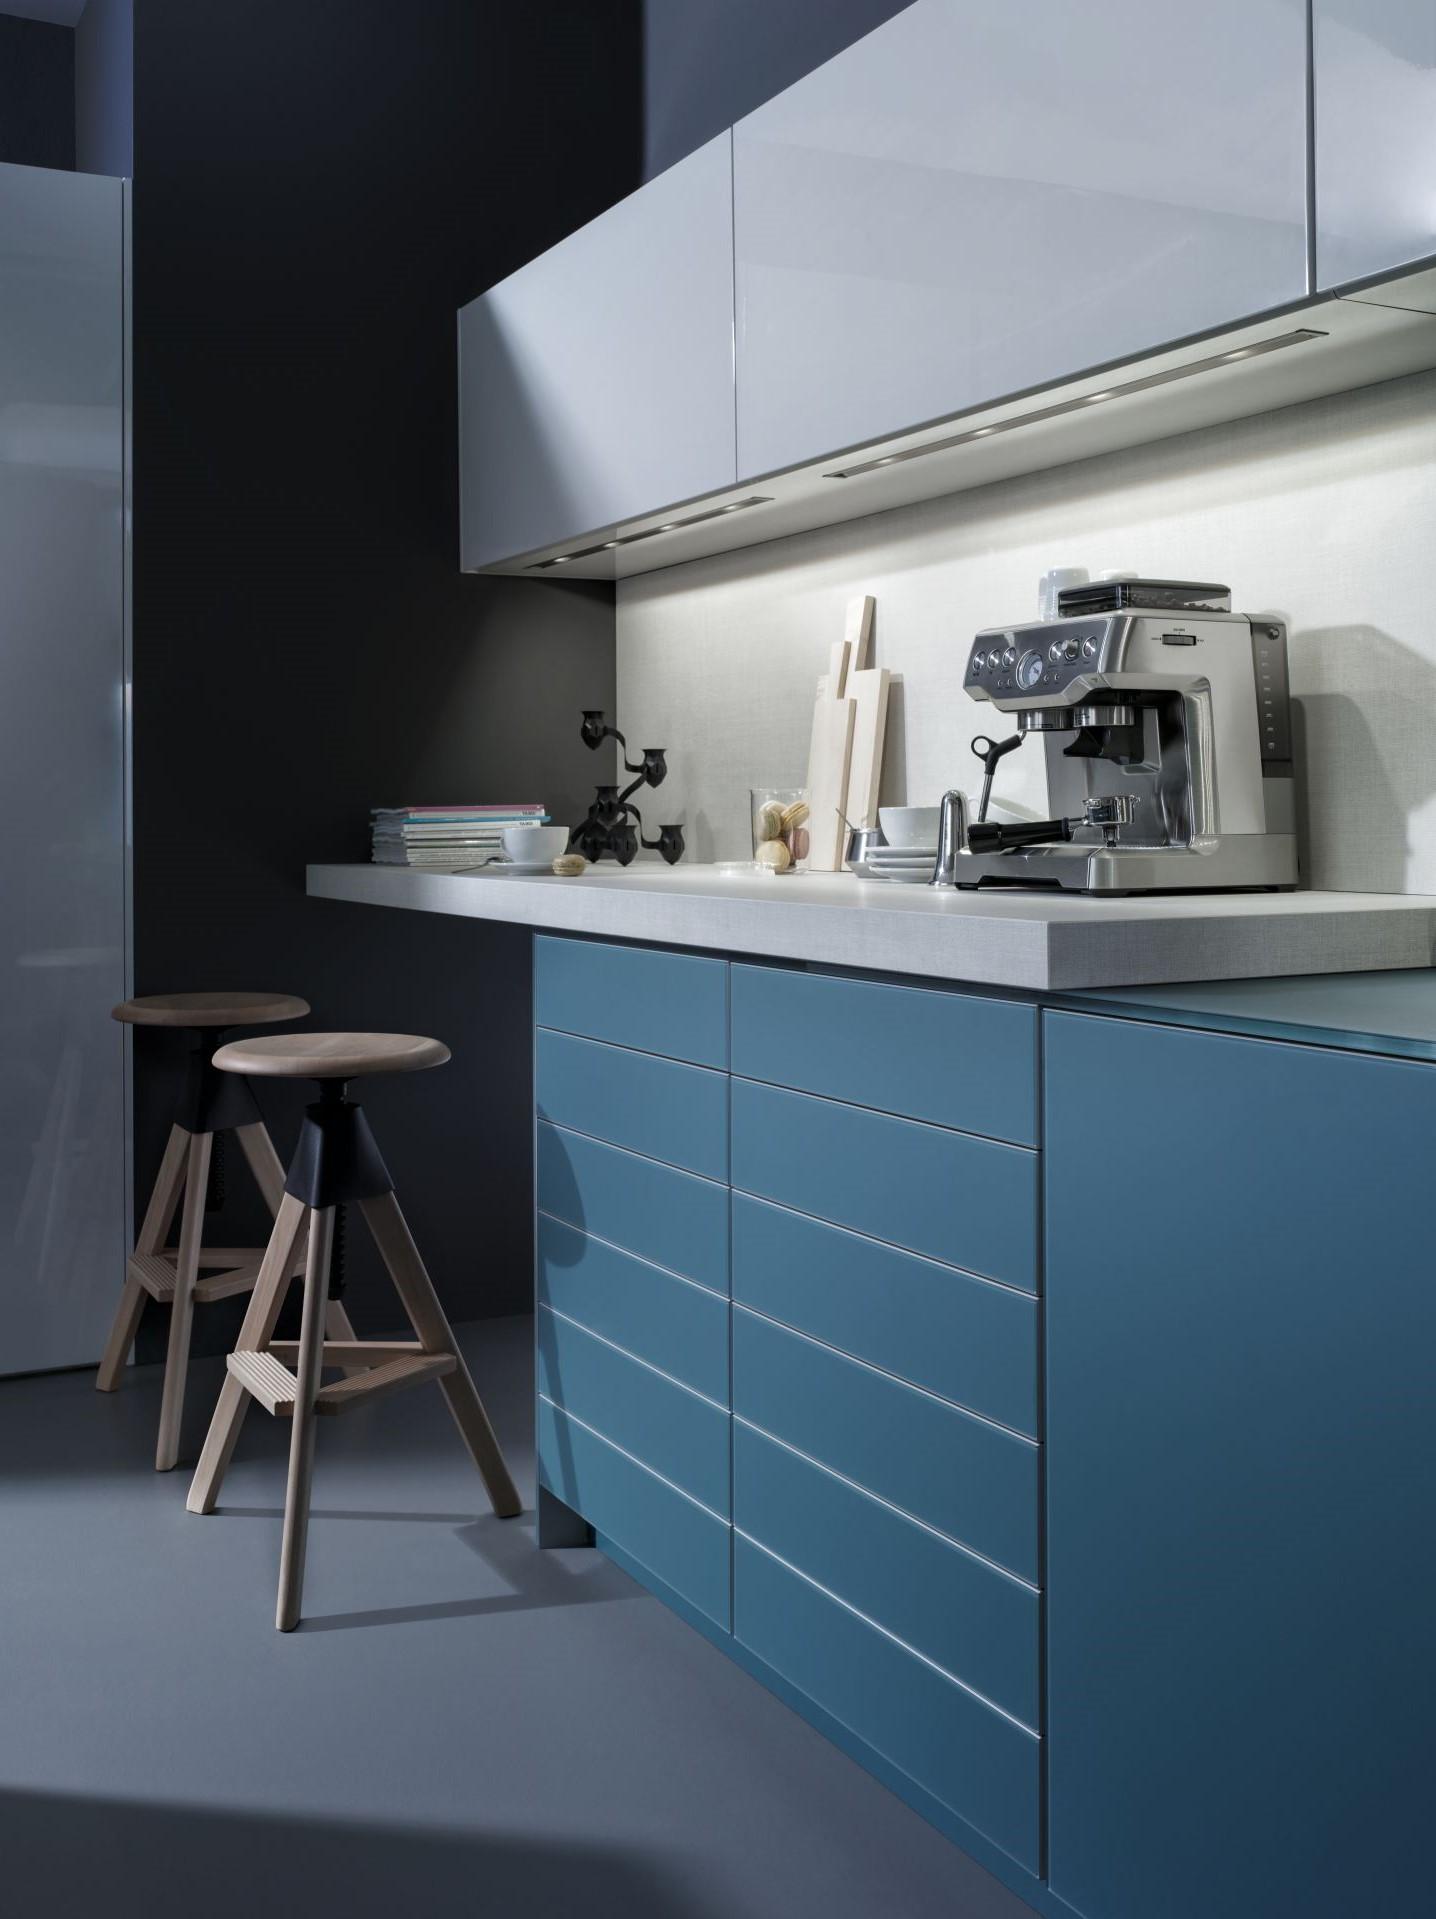 Armoire de cuisine bleu canard moderne.